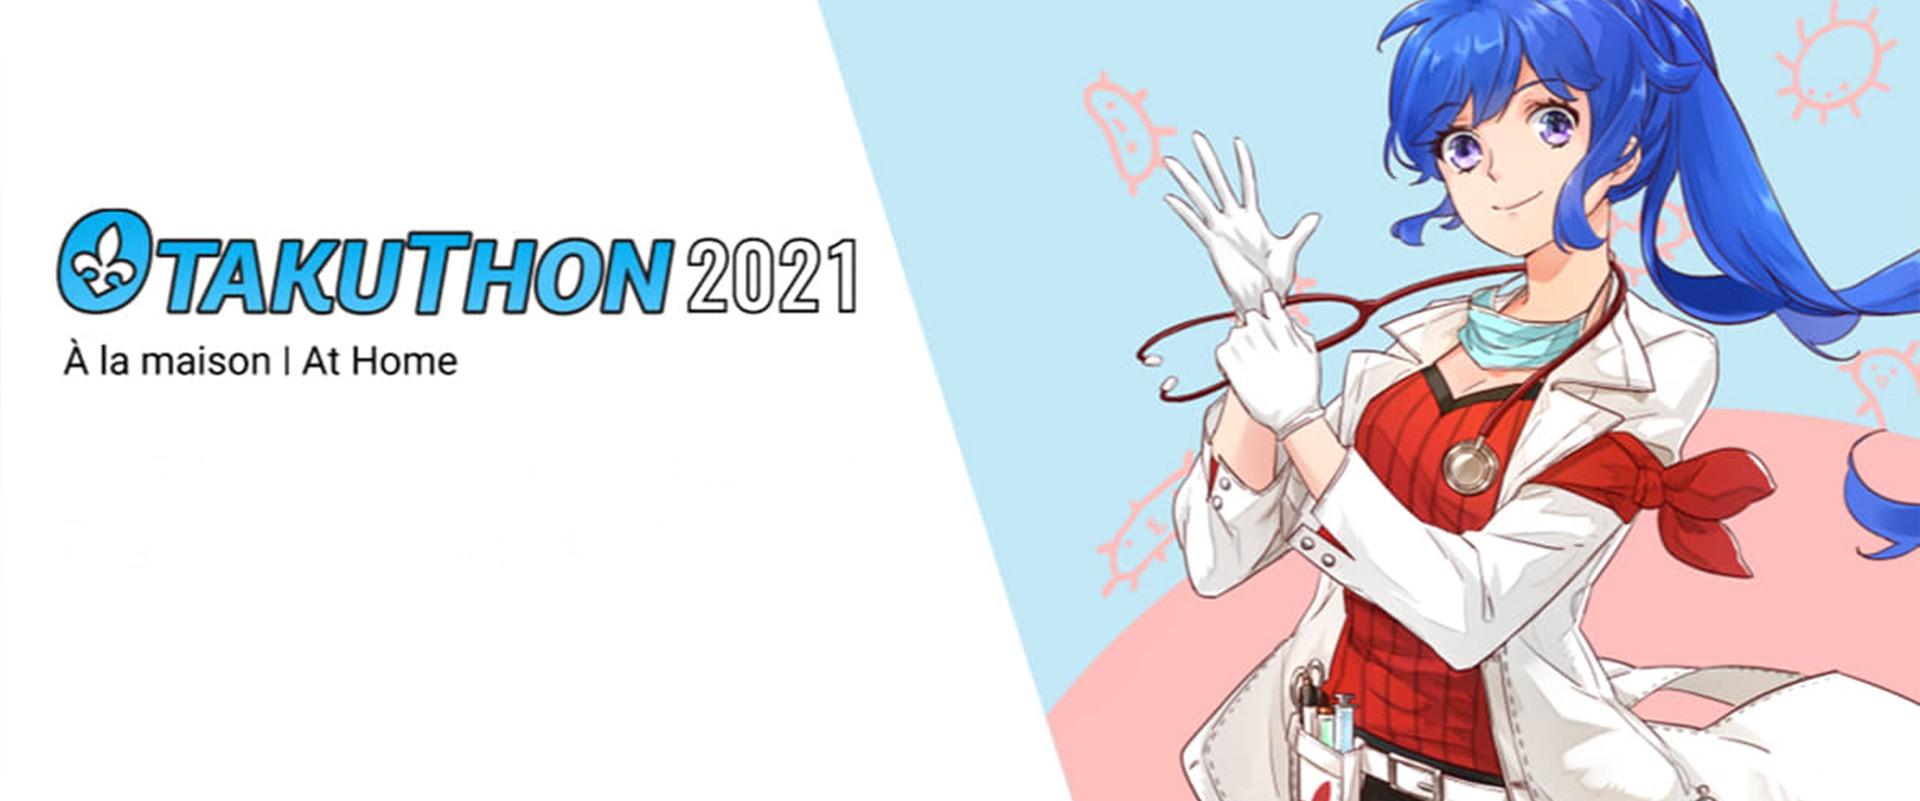 Otakuthon 2021 à la maison!